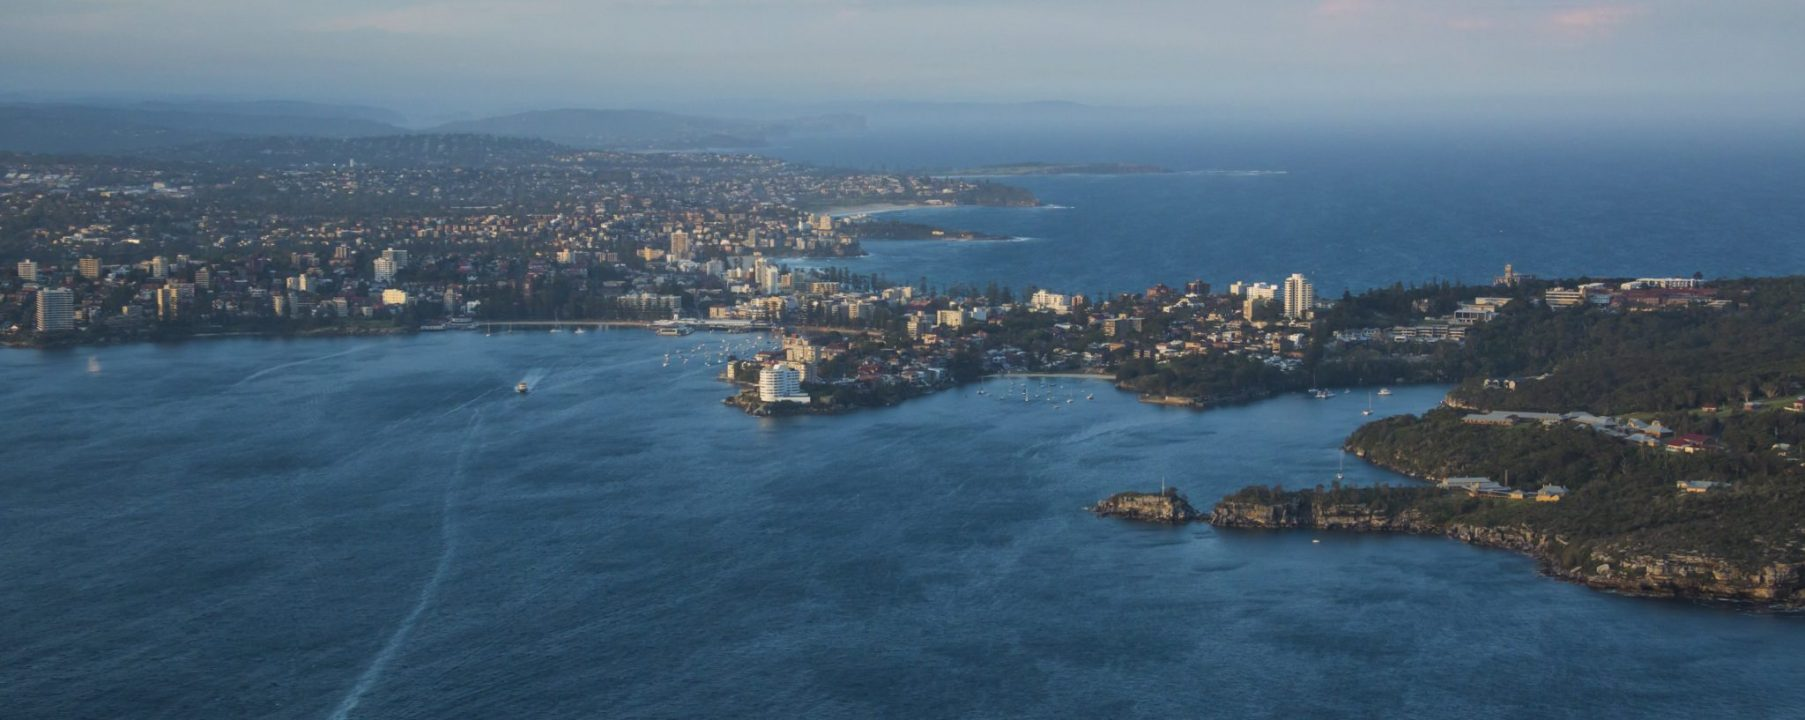 Manly Sydney Australia Dusk Aerial Photo